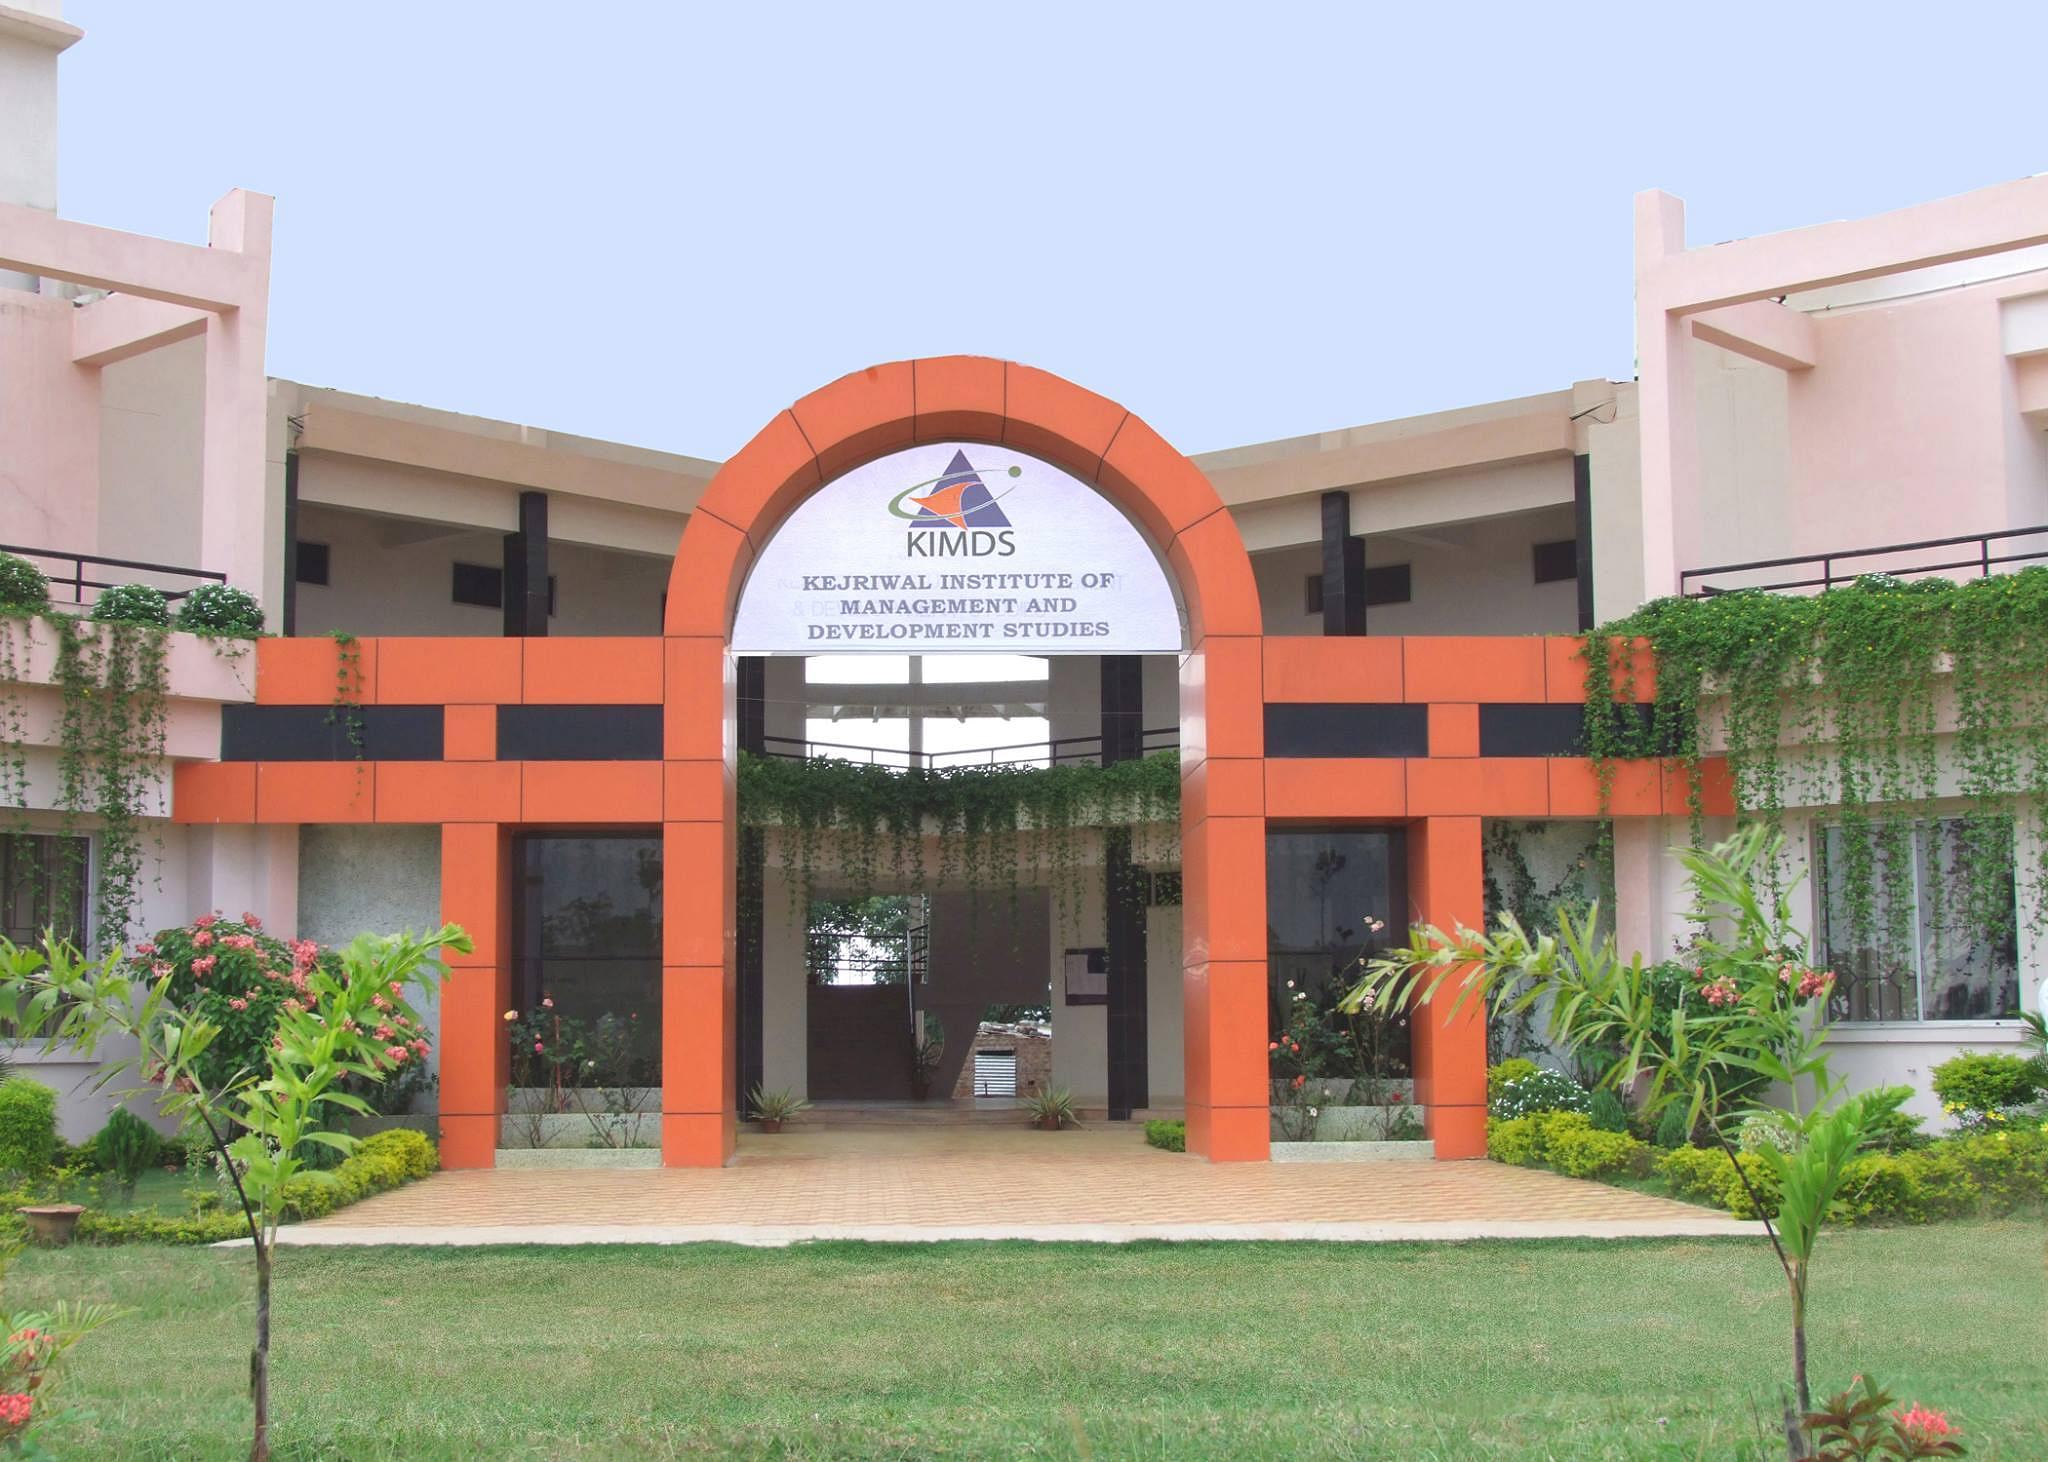 Kejriwal Institute of Management & Development Studies - [KIMDS]